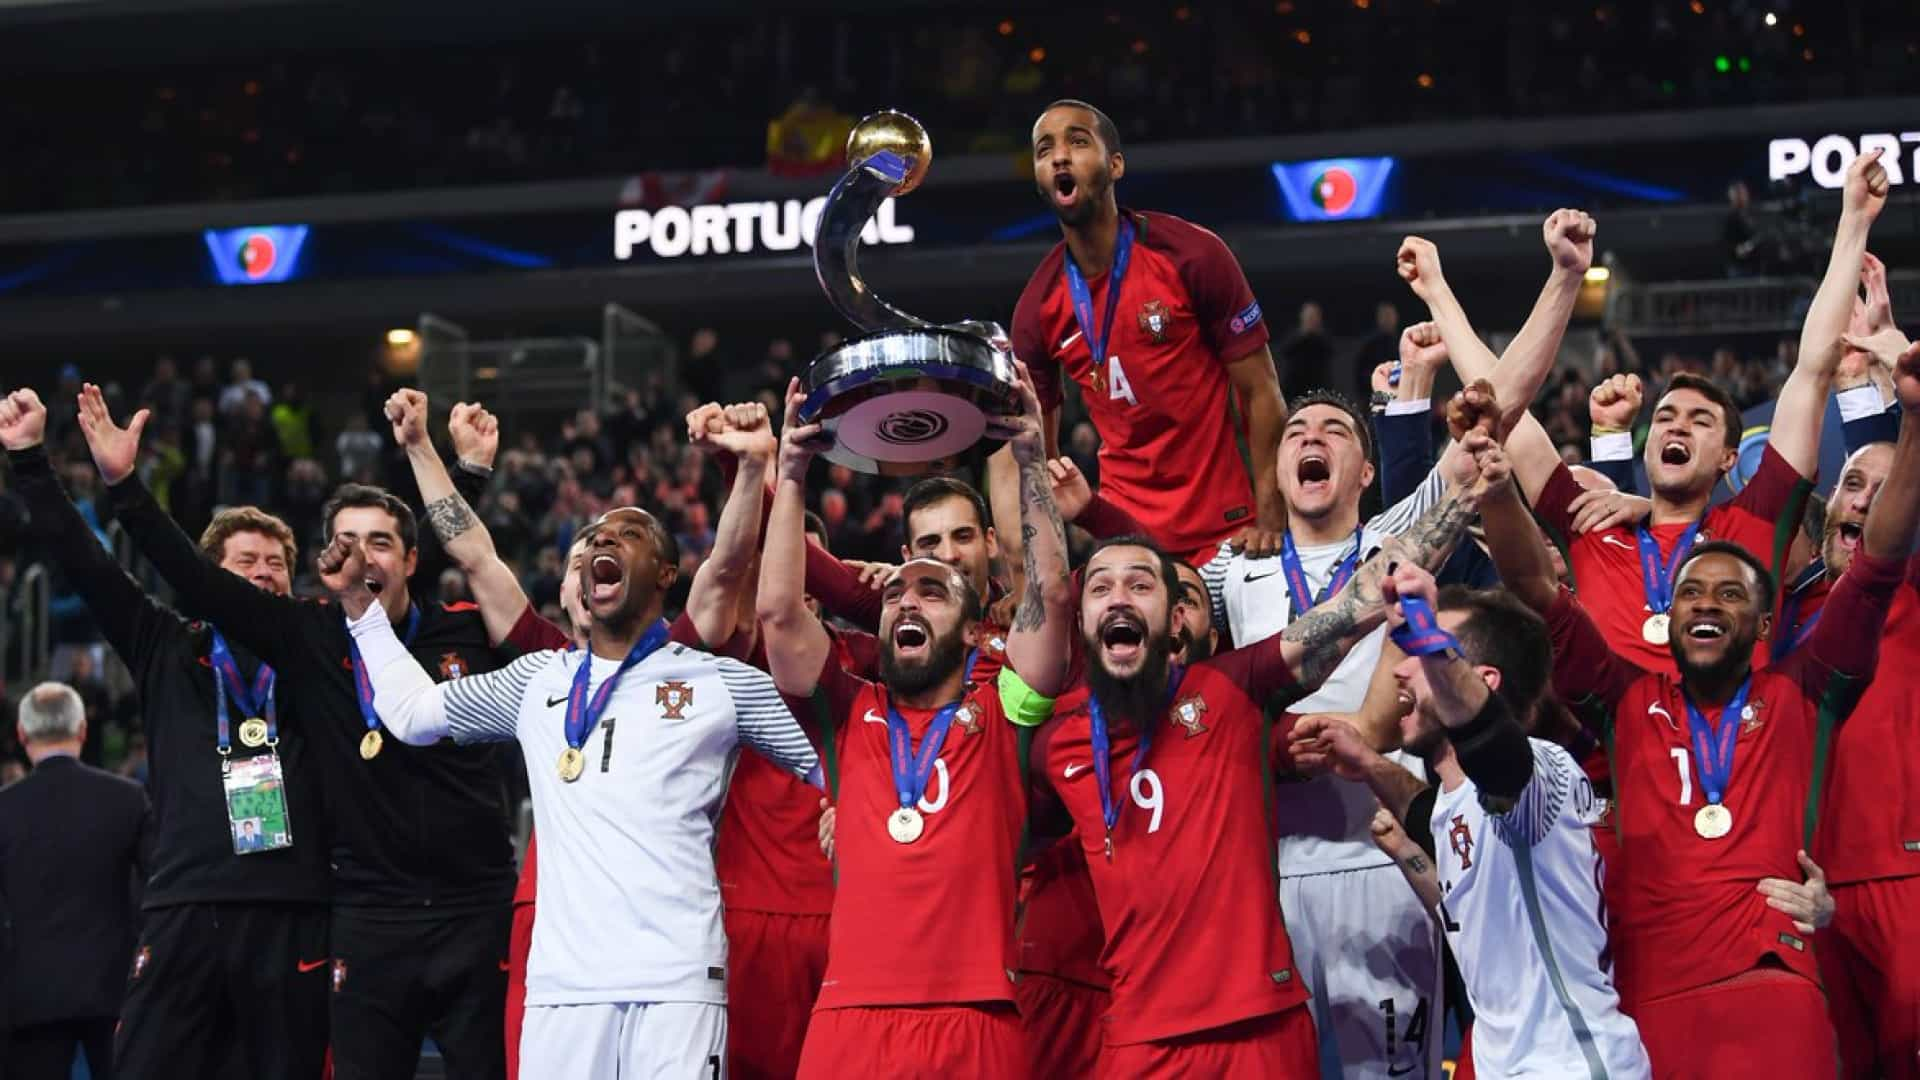 Histórico  Portugal sagra-se campeão da Europa em futsal 100b118bd1843